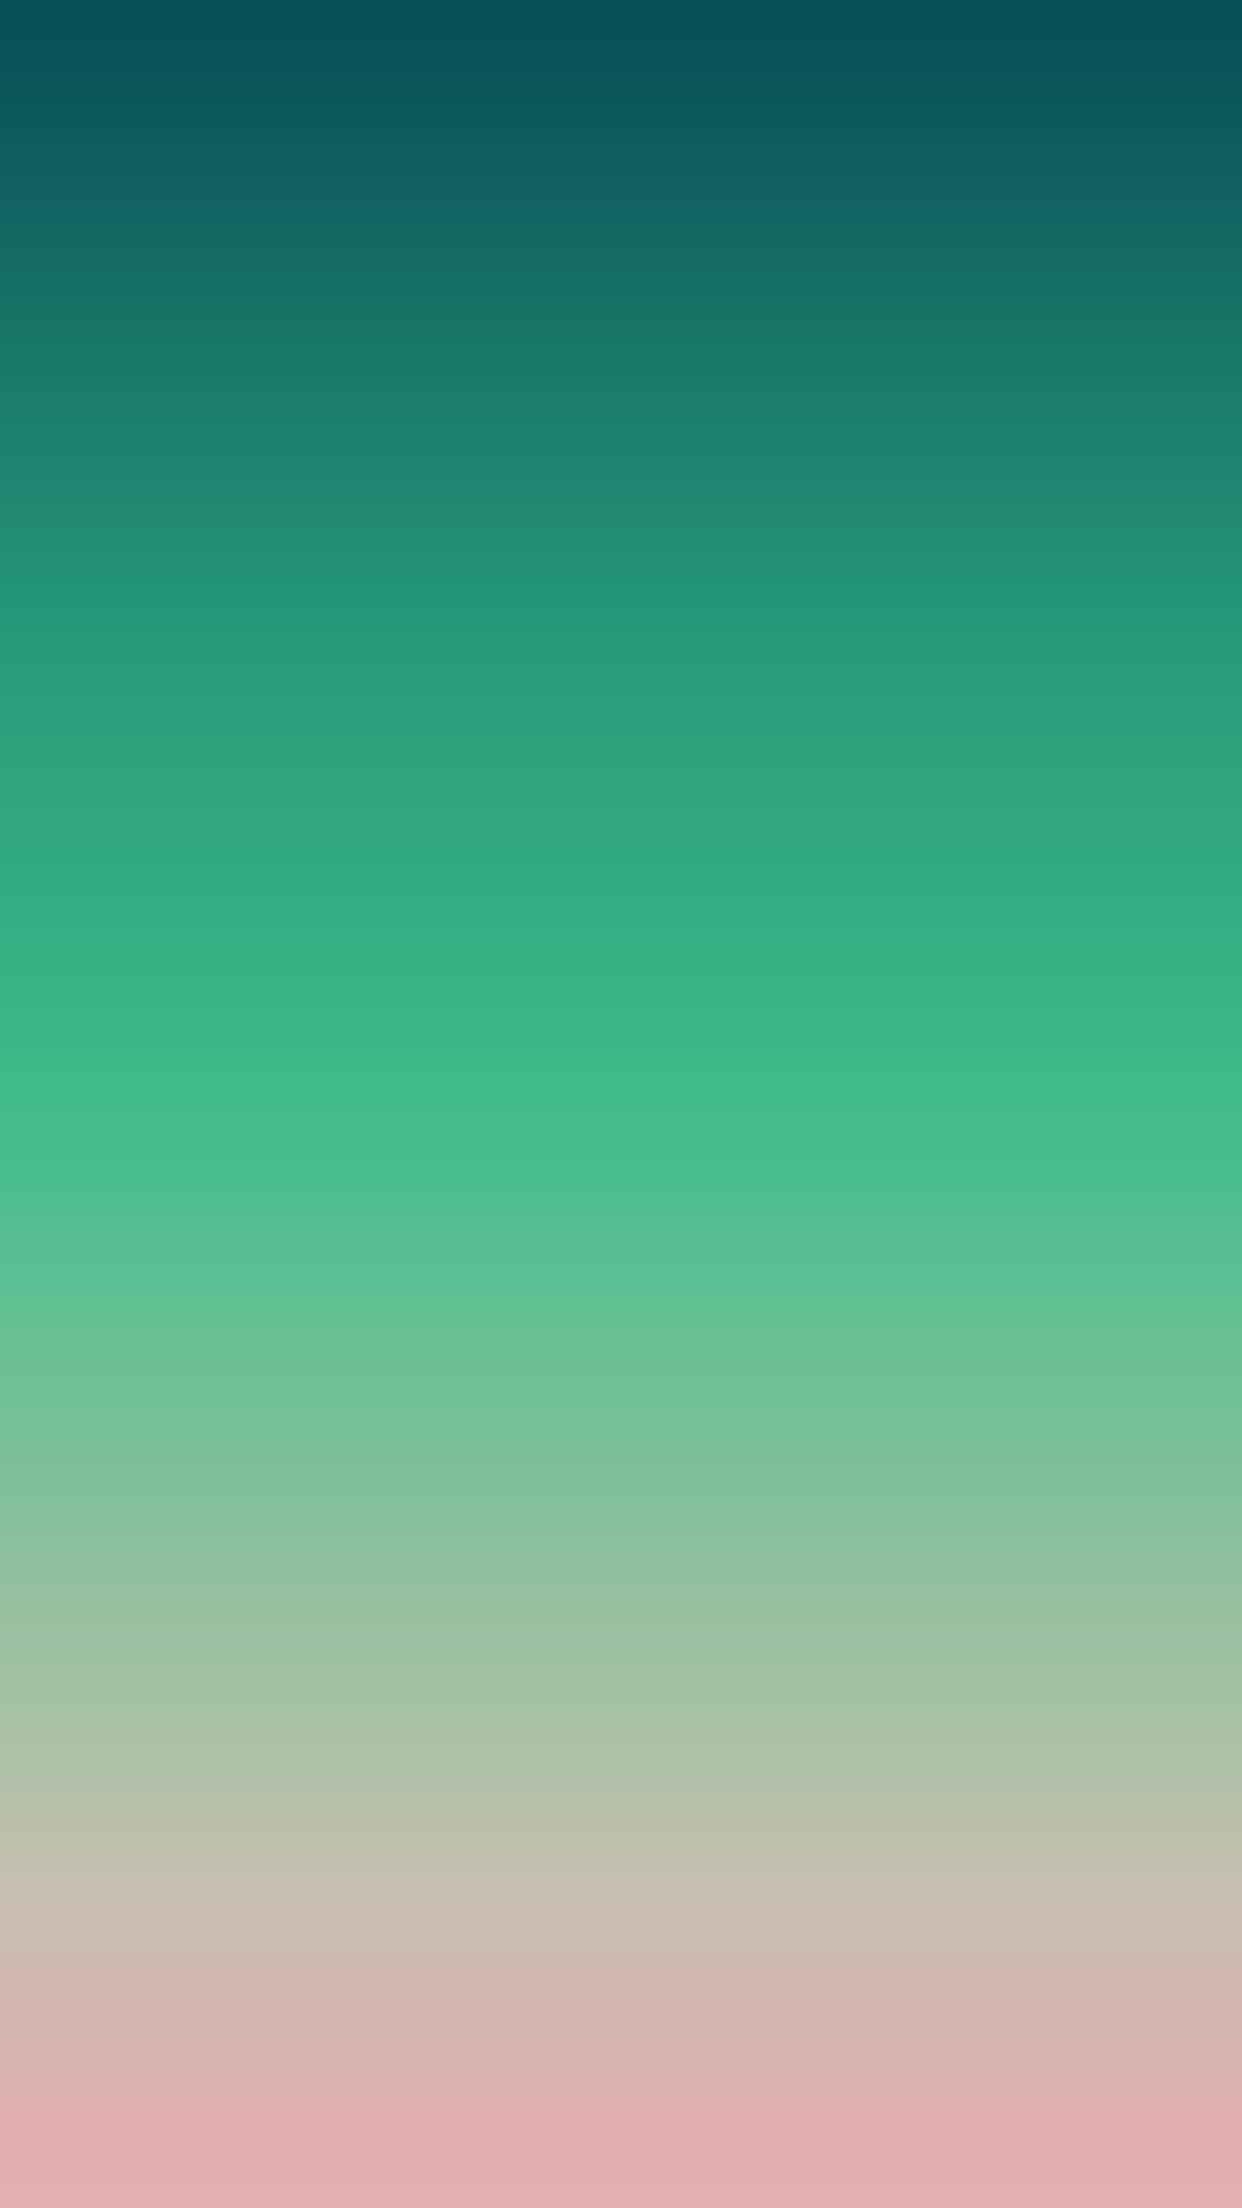 Iphonexpapers Com Iphone X Wallpaper Sl26 Iphone8 Ios11 Background Green Blur Gradation